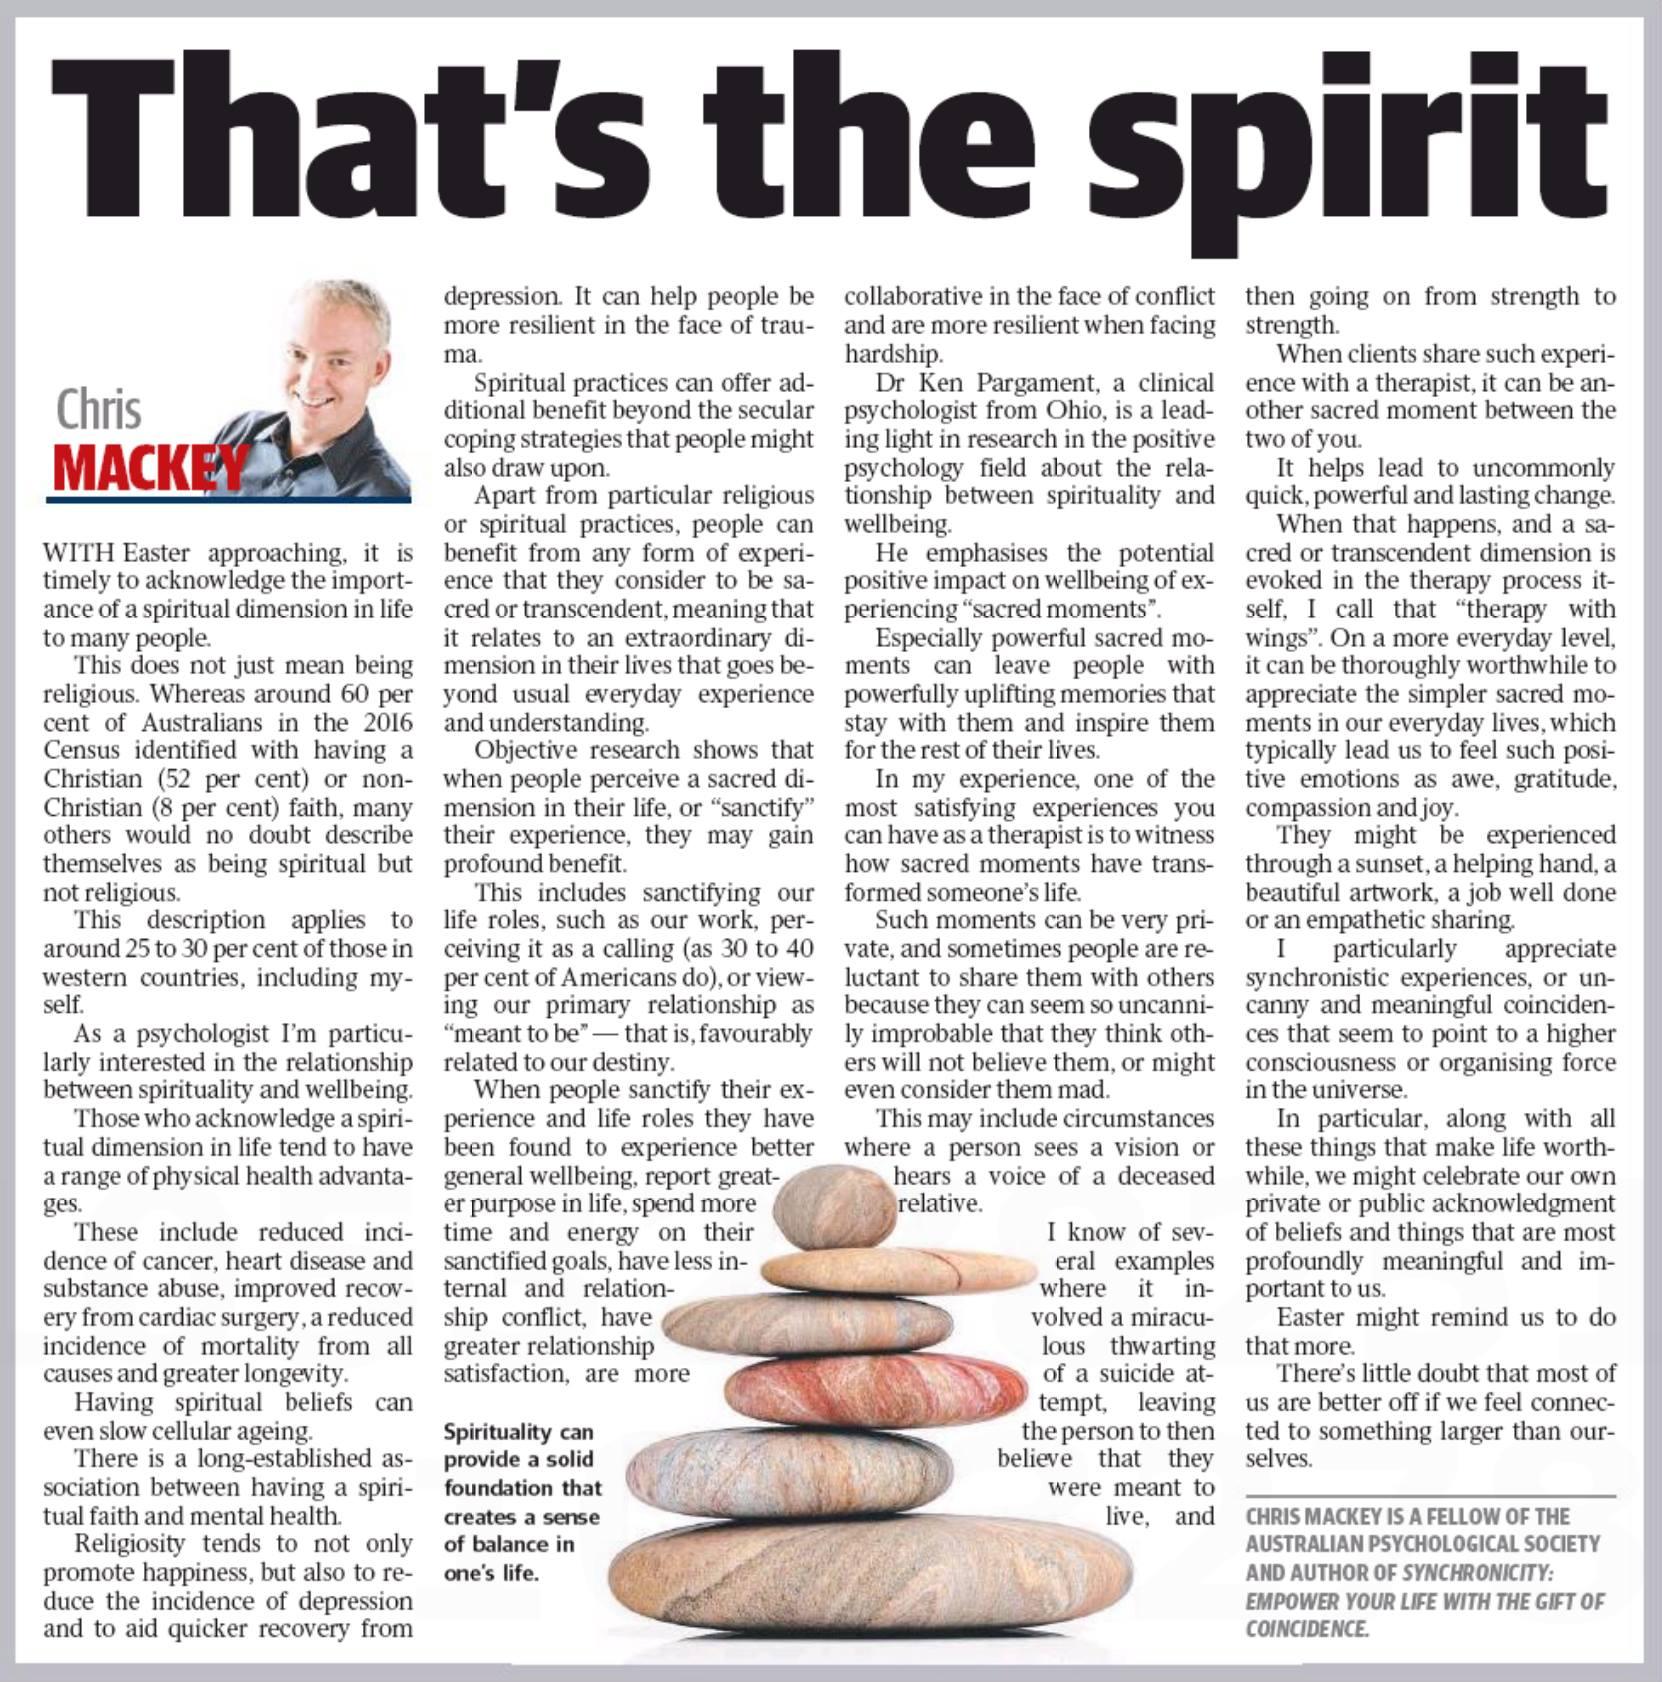 An by Geelong psychologist, Chris Mackey